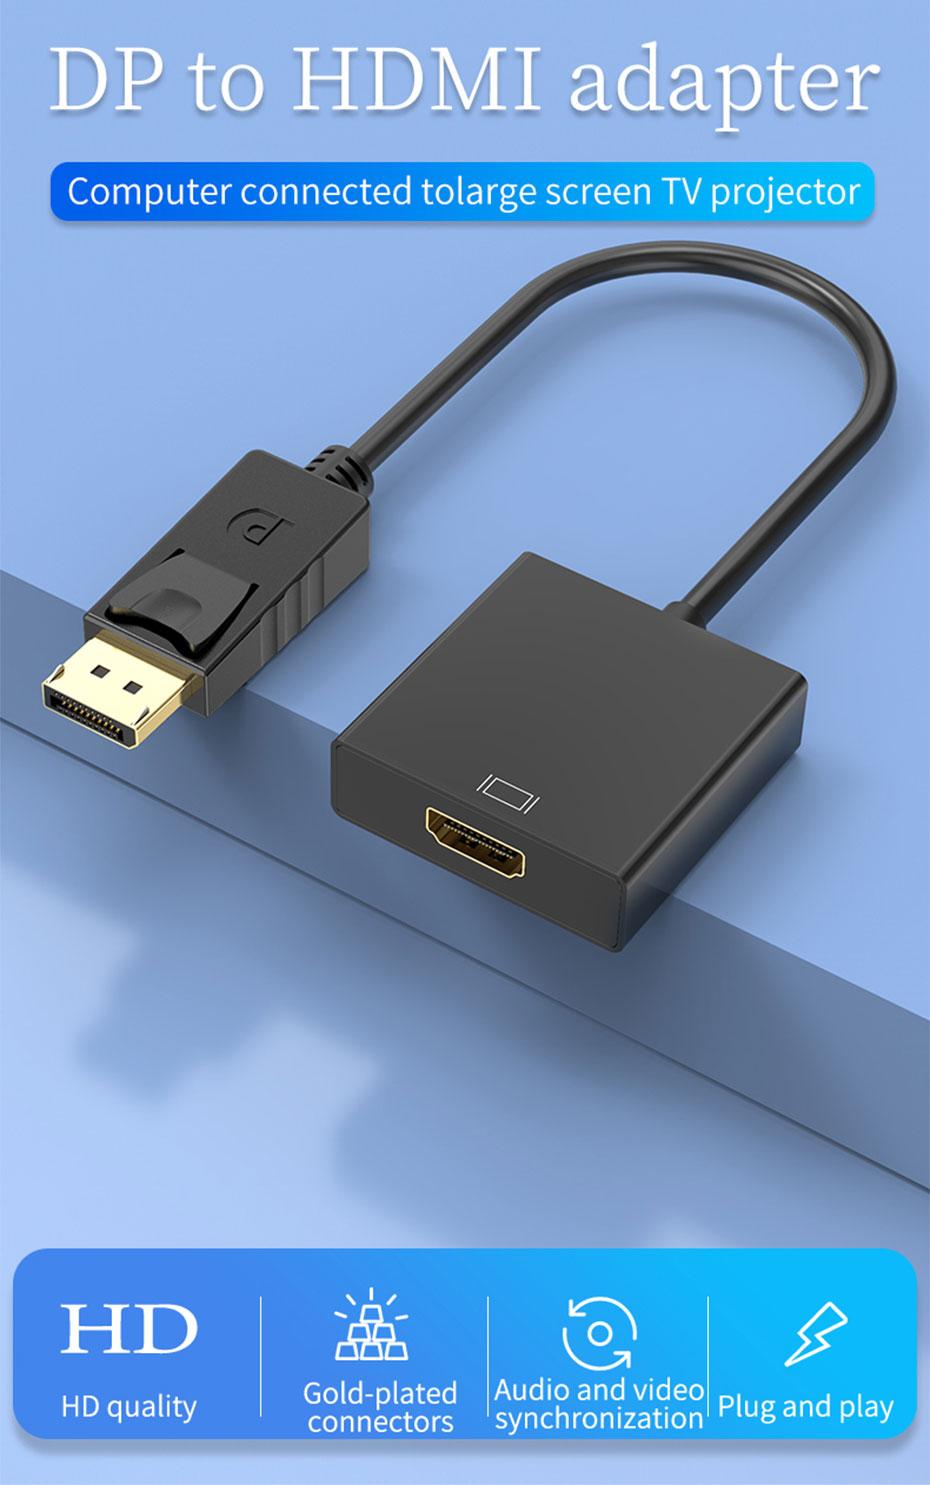 DP to HDMI converter DH